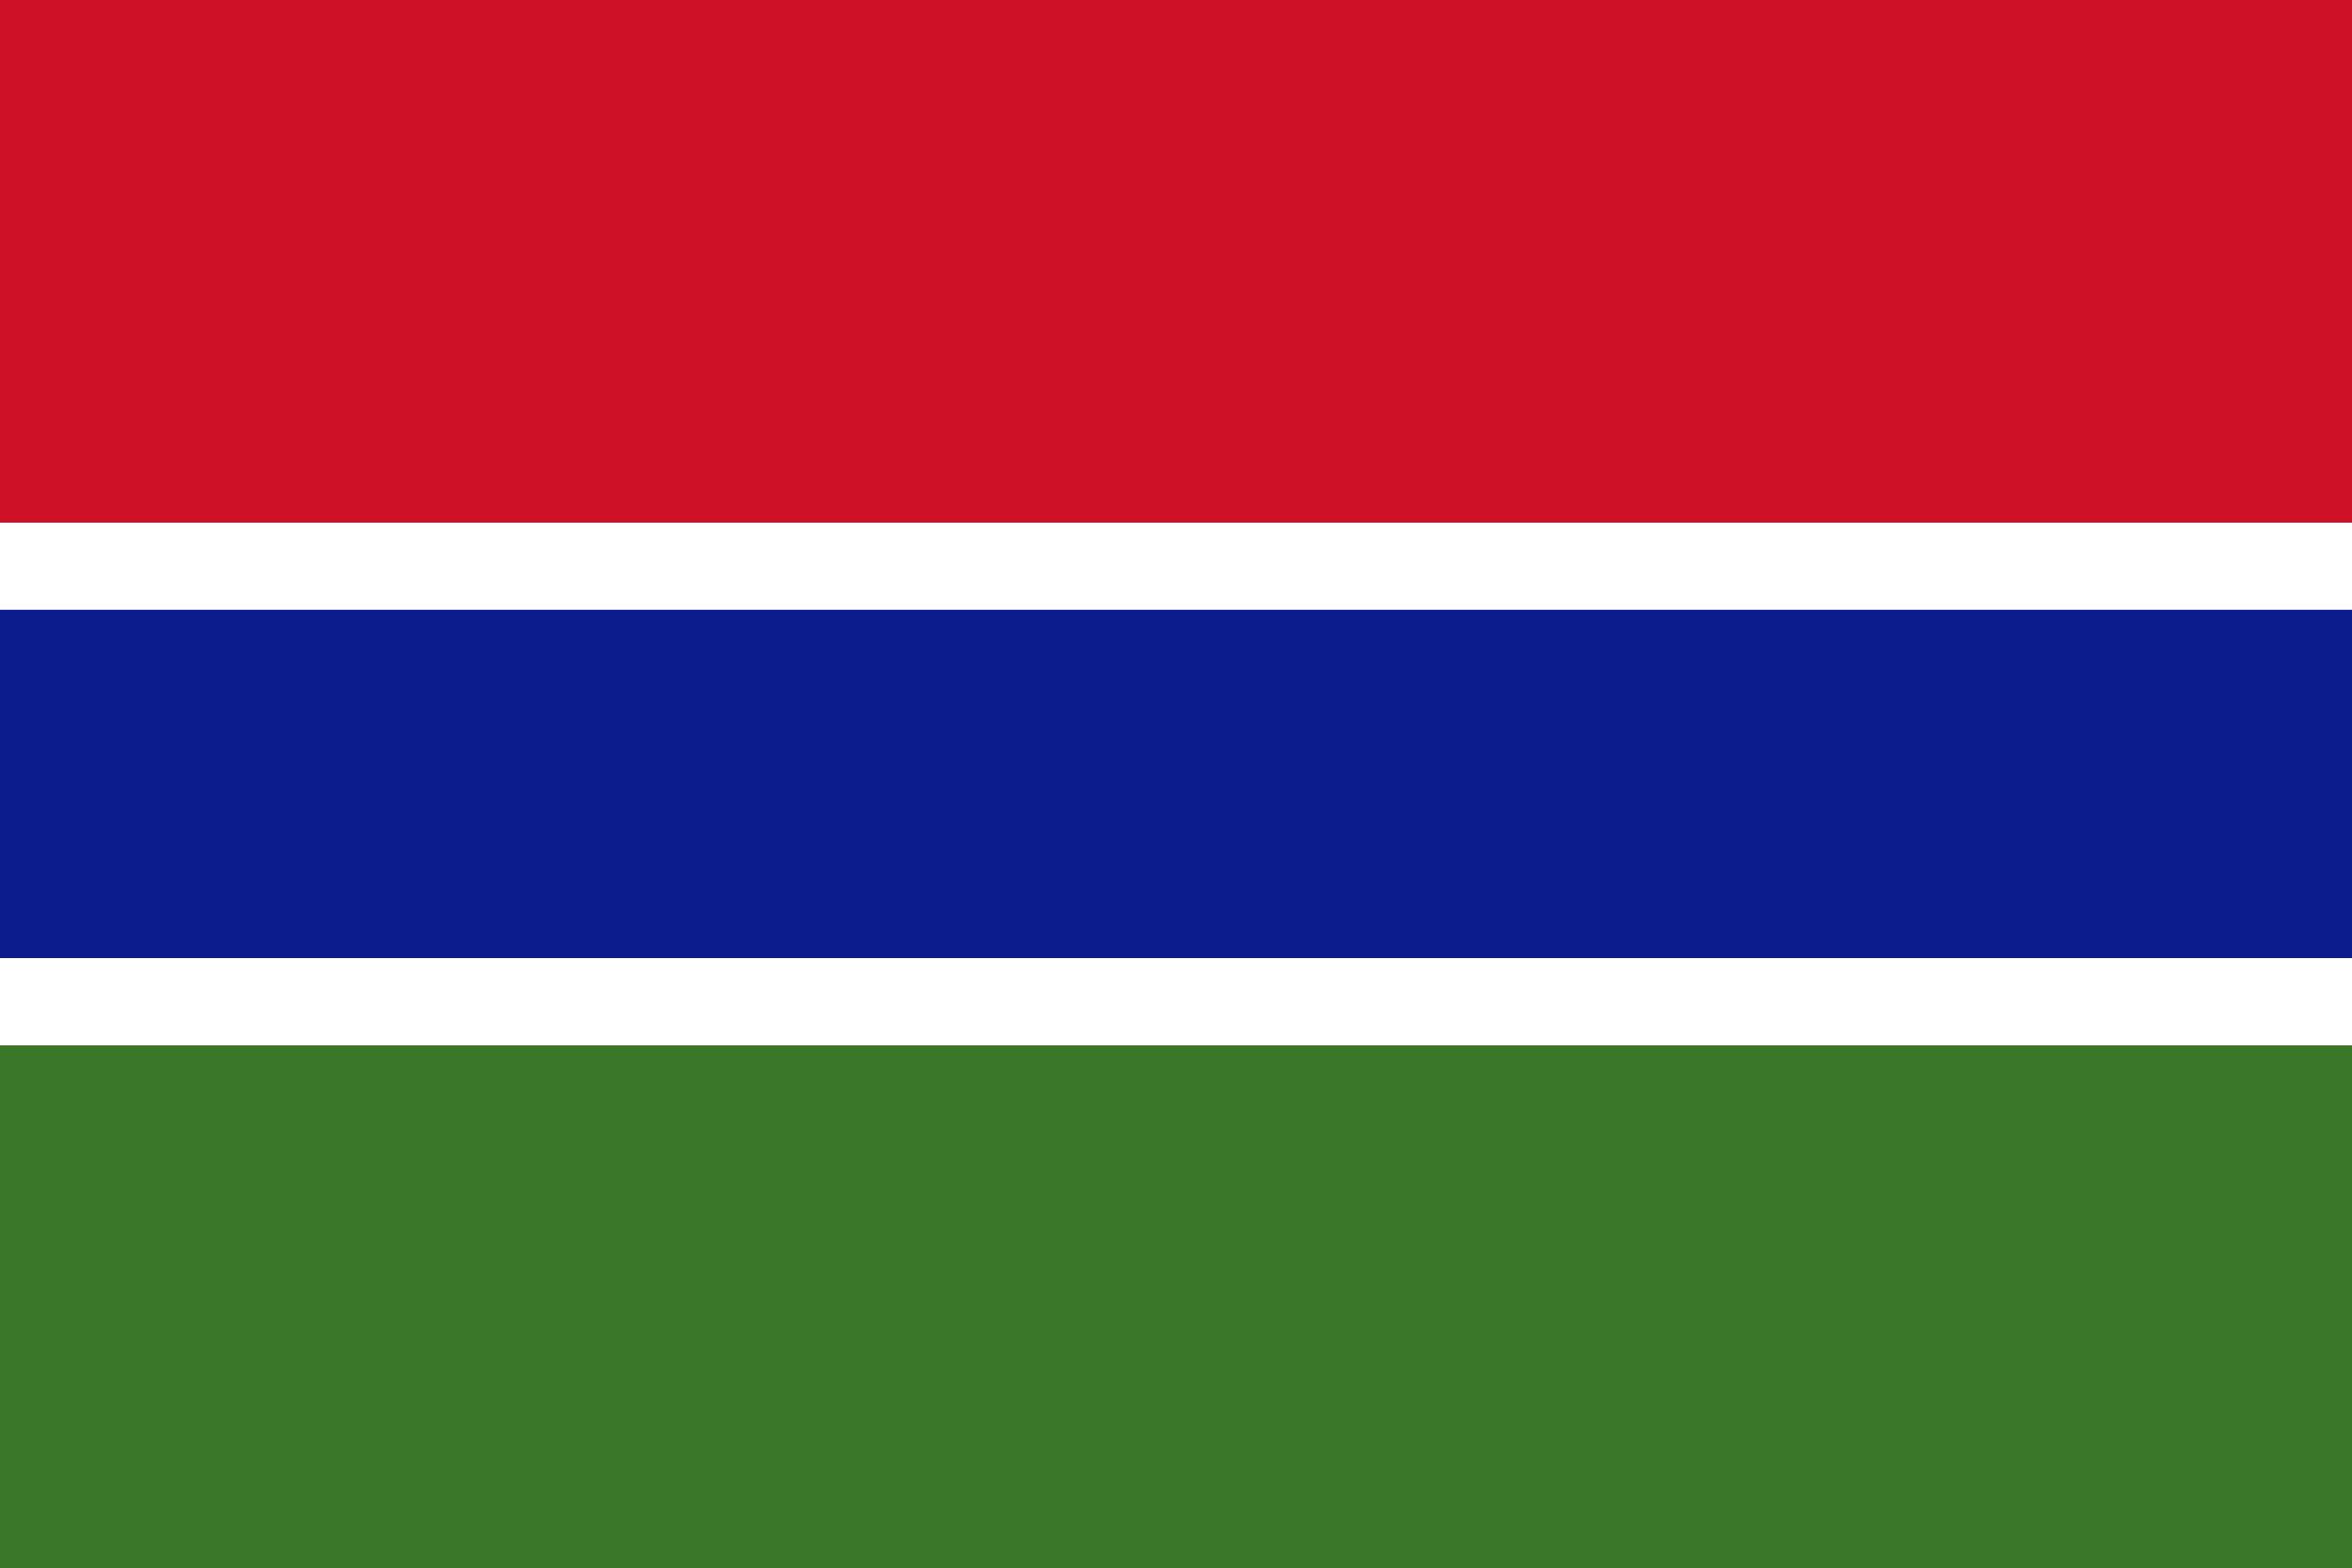 Gâmbia, país, Brasão de armas, logotipo, símbolo - Papéis de parede HD - Professor-falken.com